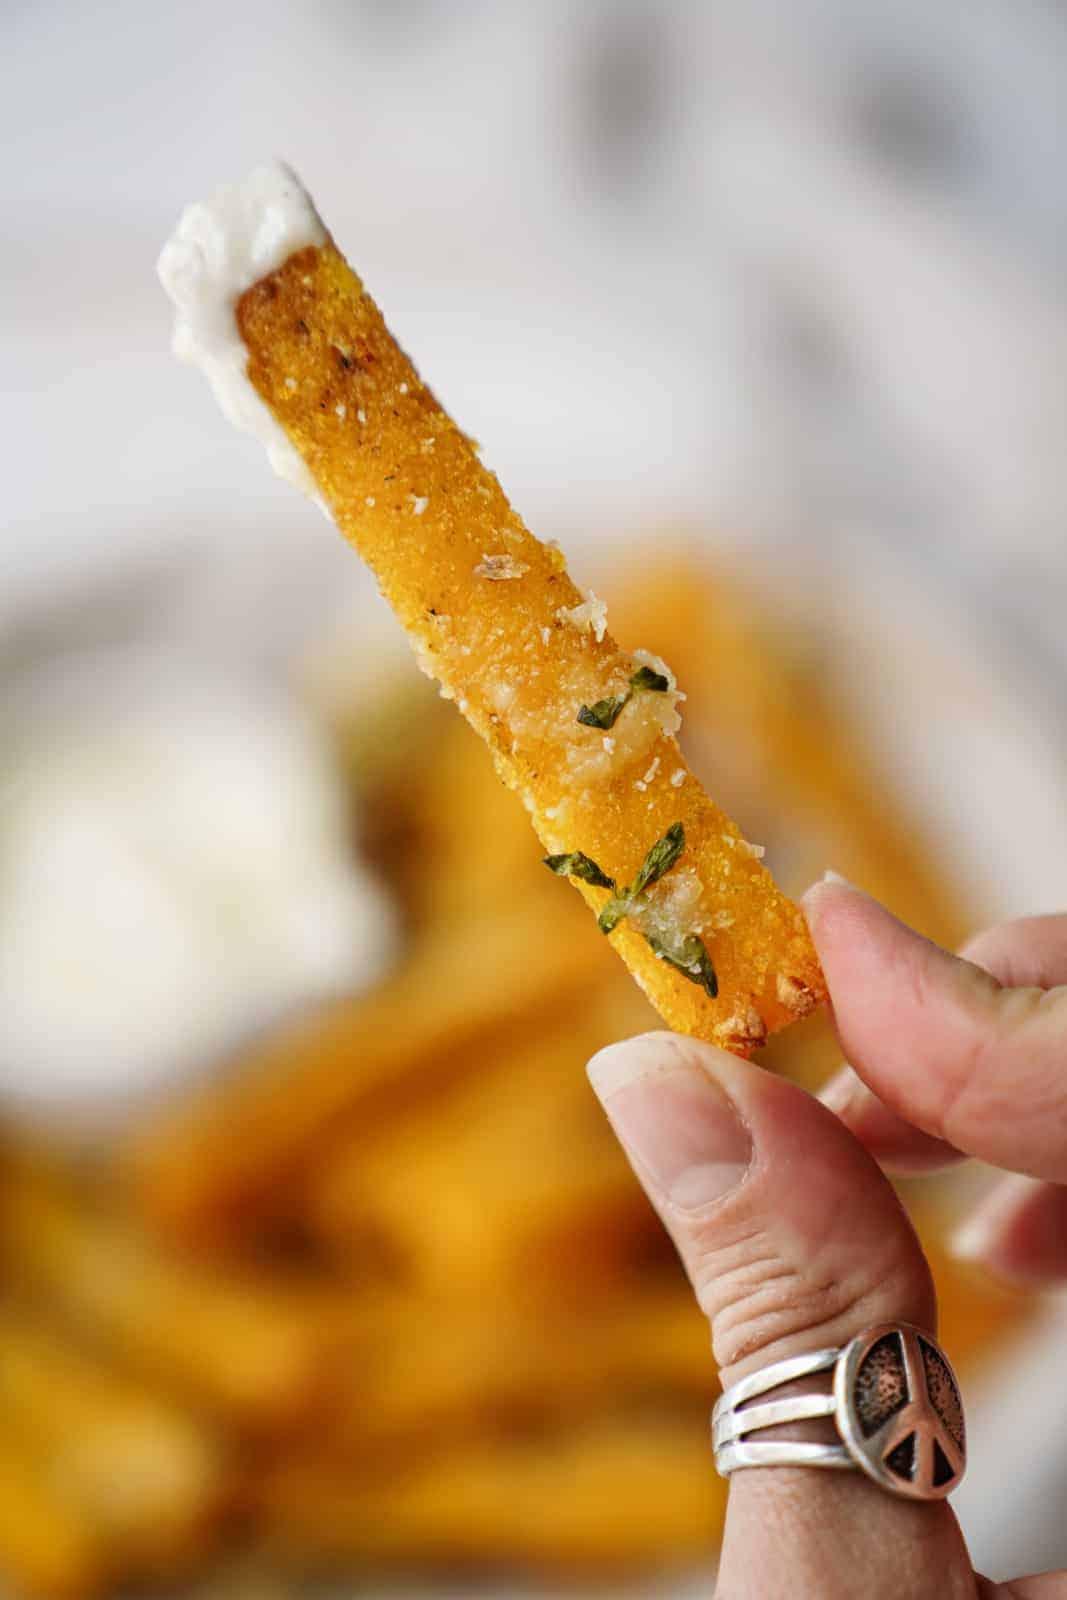 Hand holding a vegan polenta fry dipped in vegan aioli